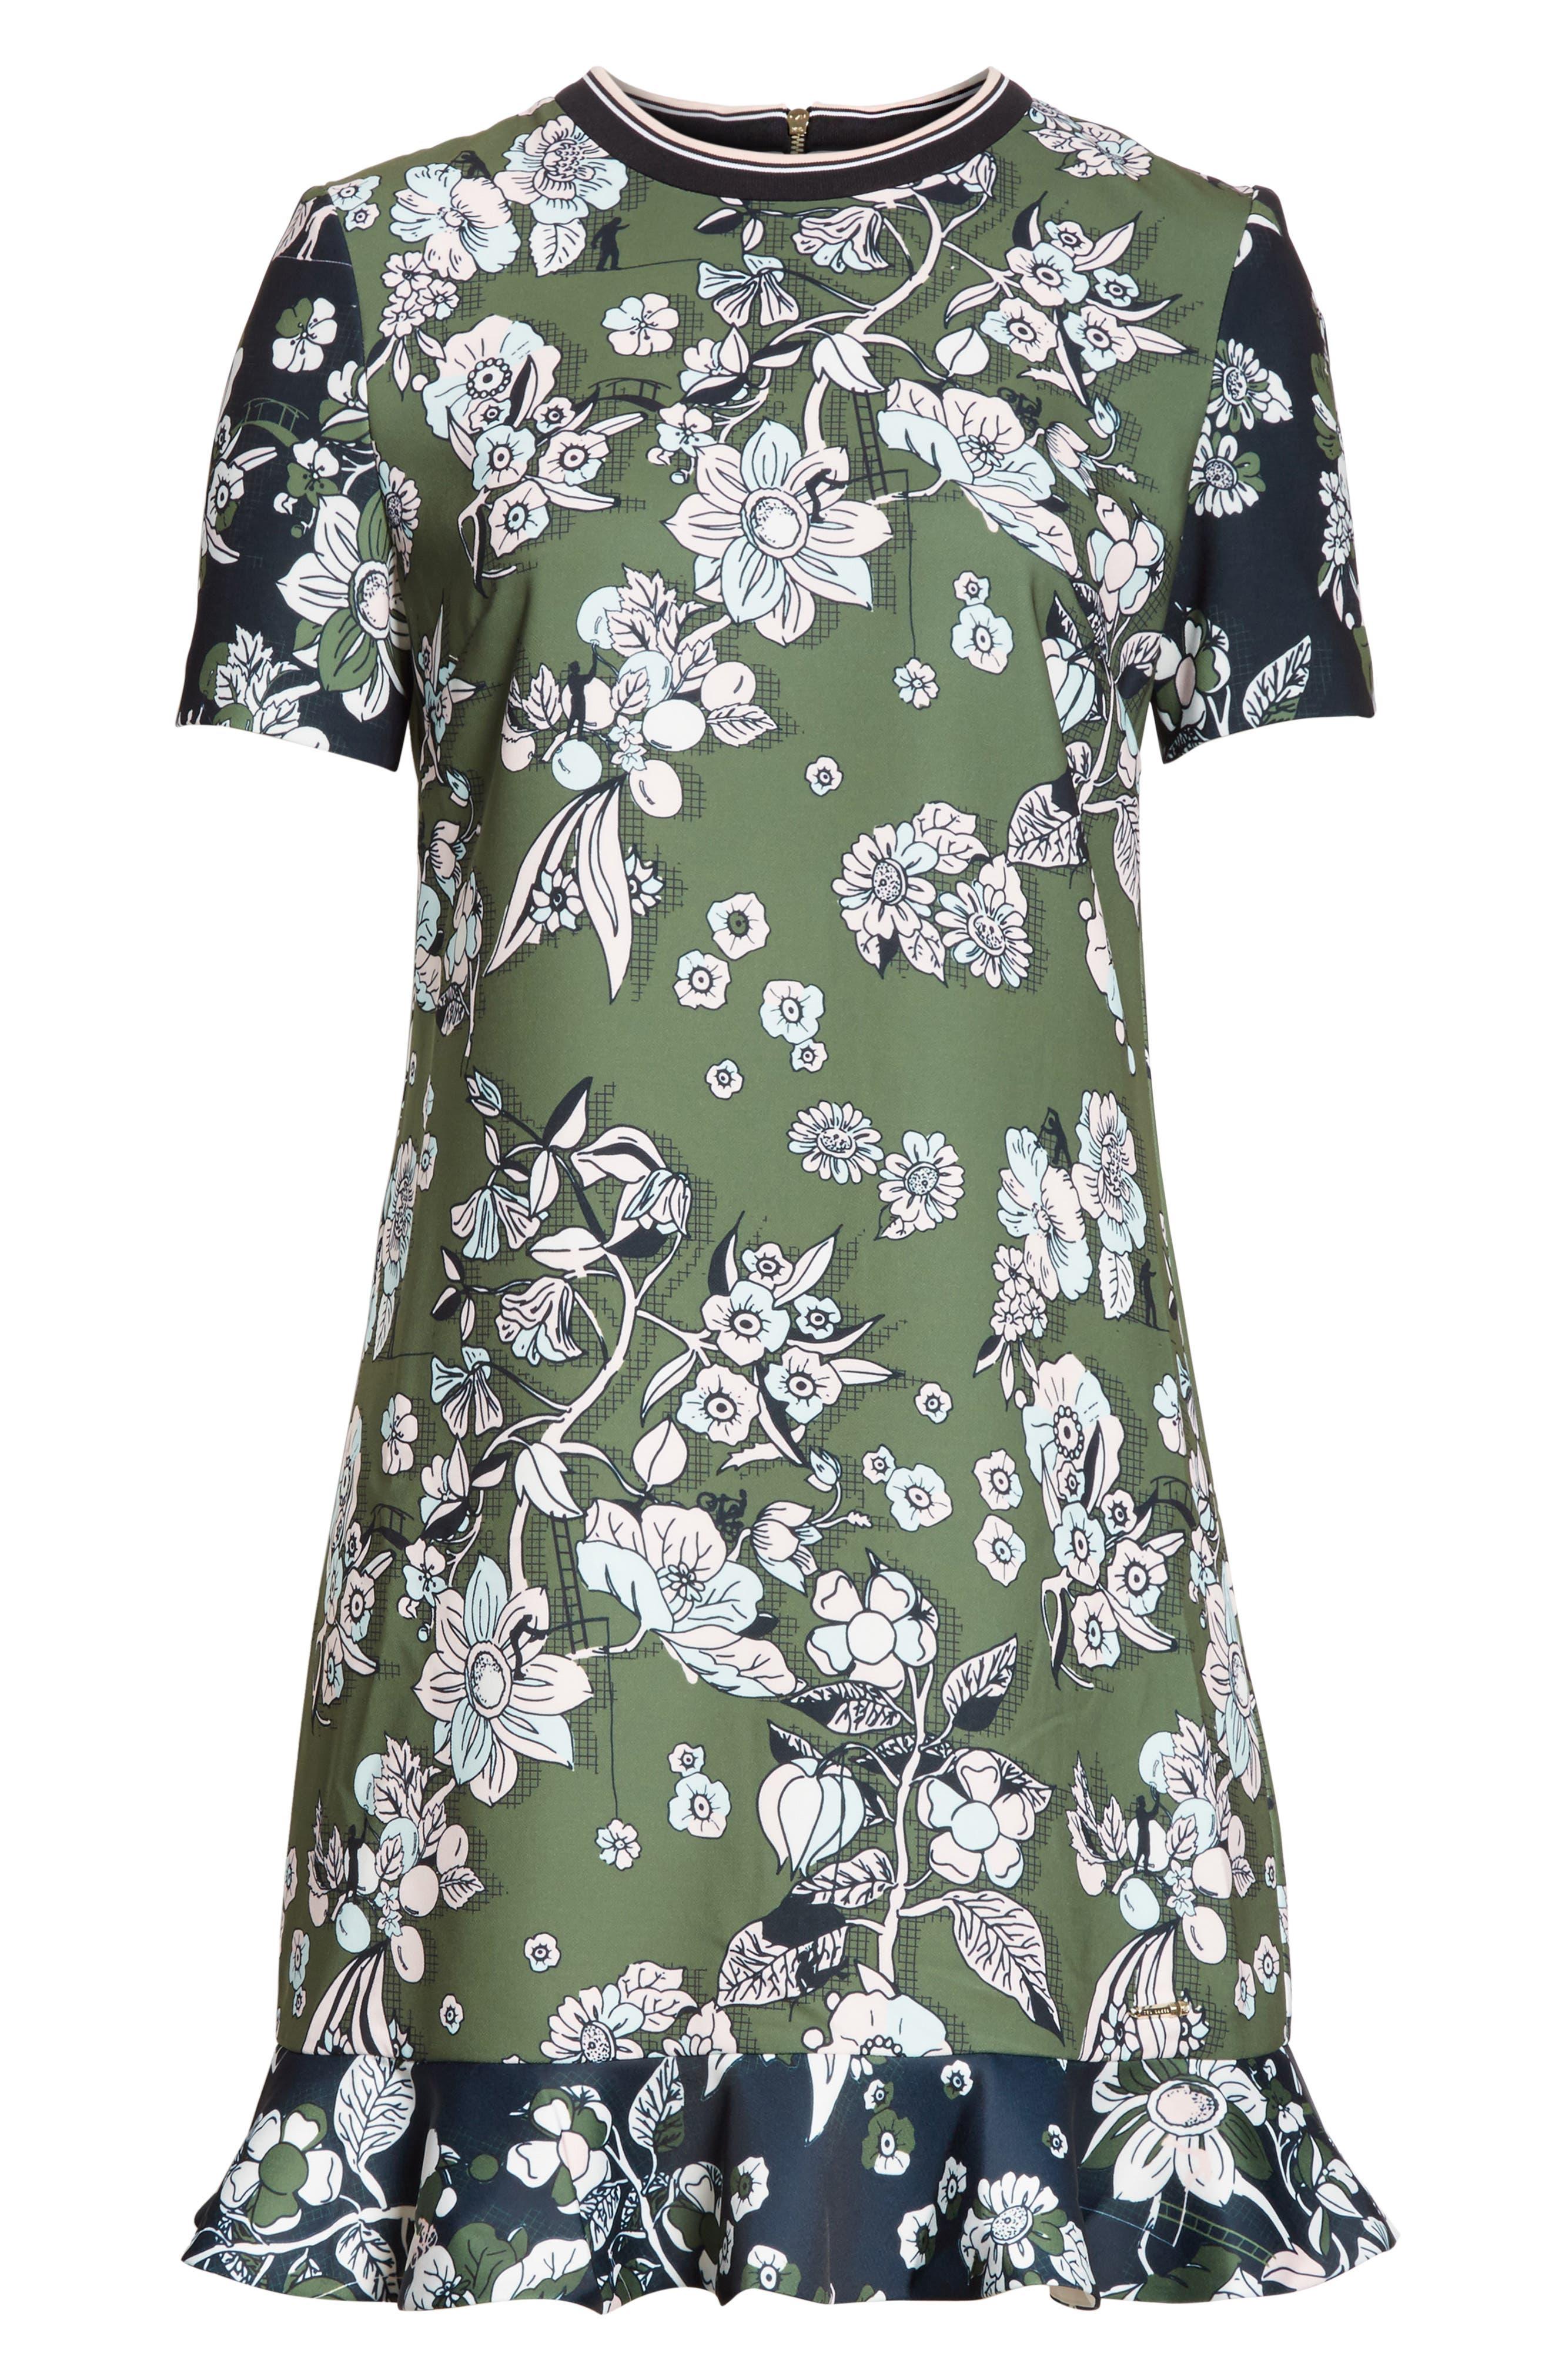 Hoster Floral Print Ruffle Hem Dress,                             Alternate thumbnail 6, color,                             Green